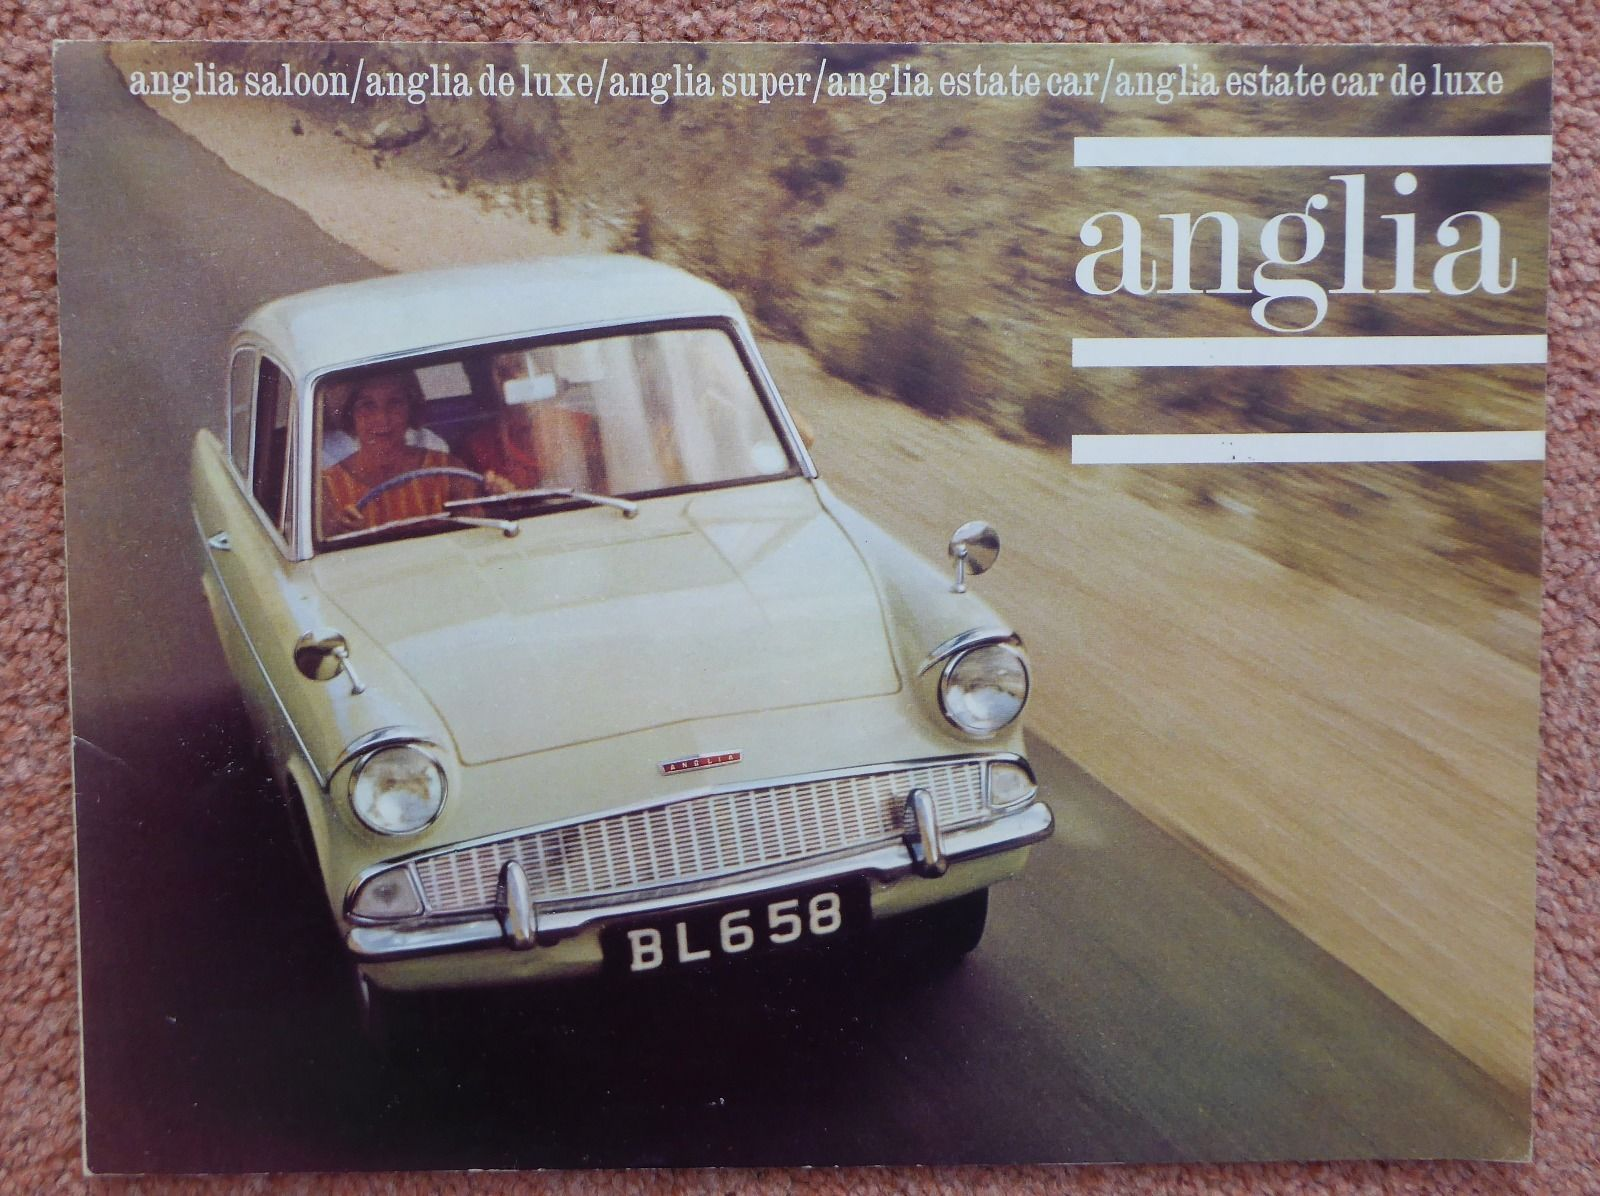 Ebay 1964 B Ford Anglia 123e Super In Spruce Green White With Green Interior Classiccars Cars